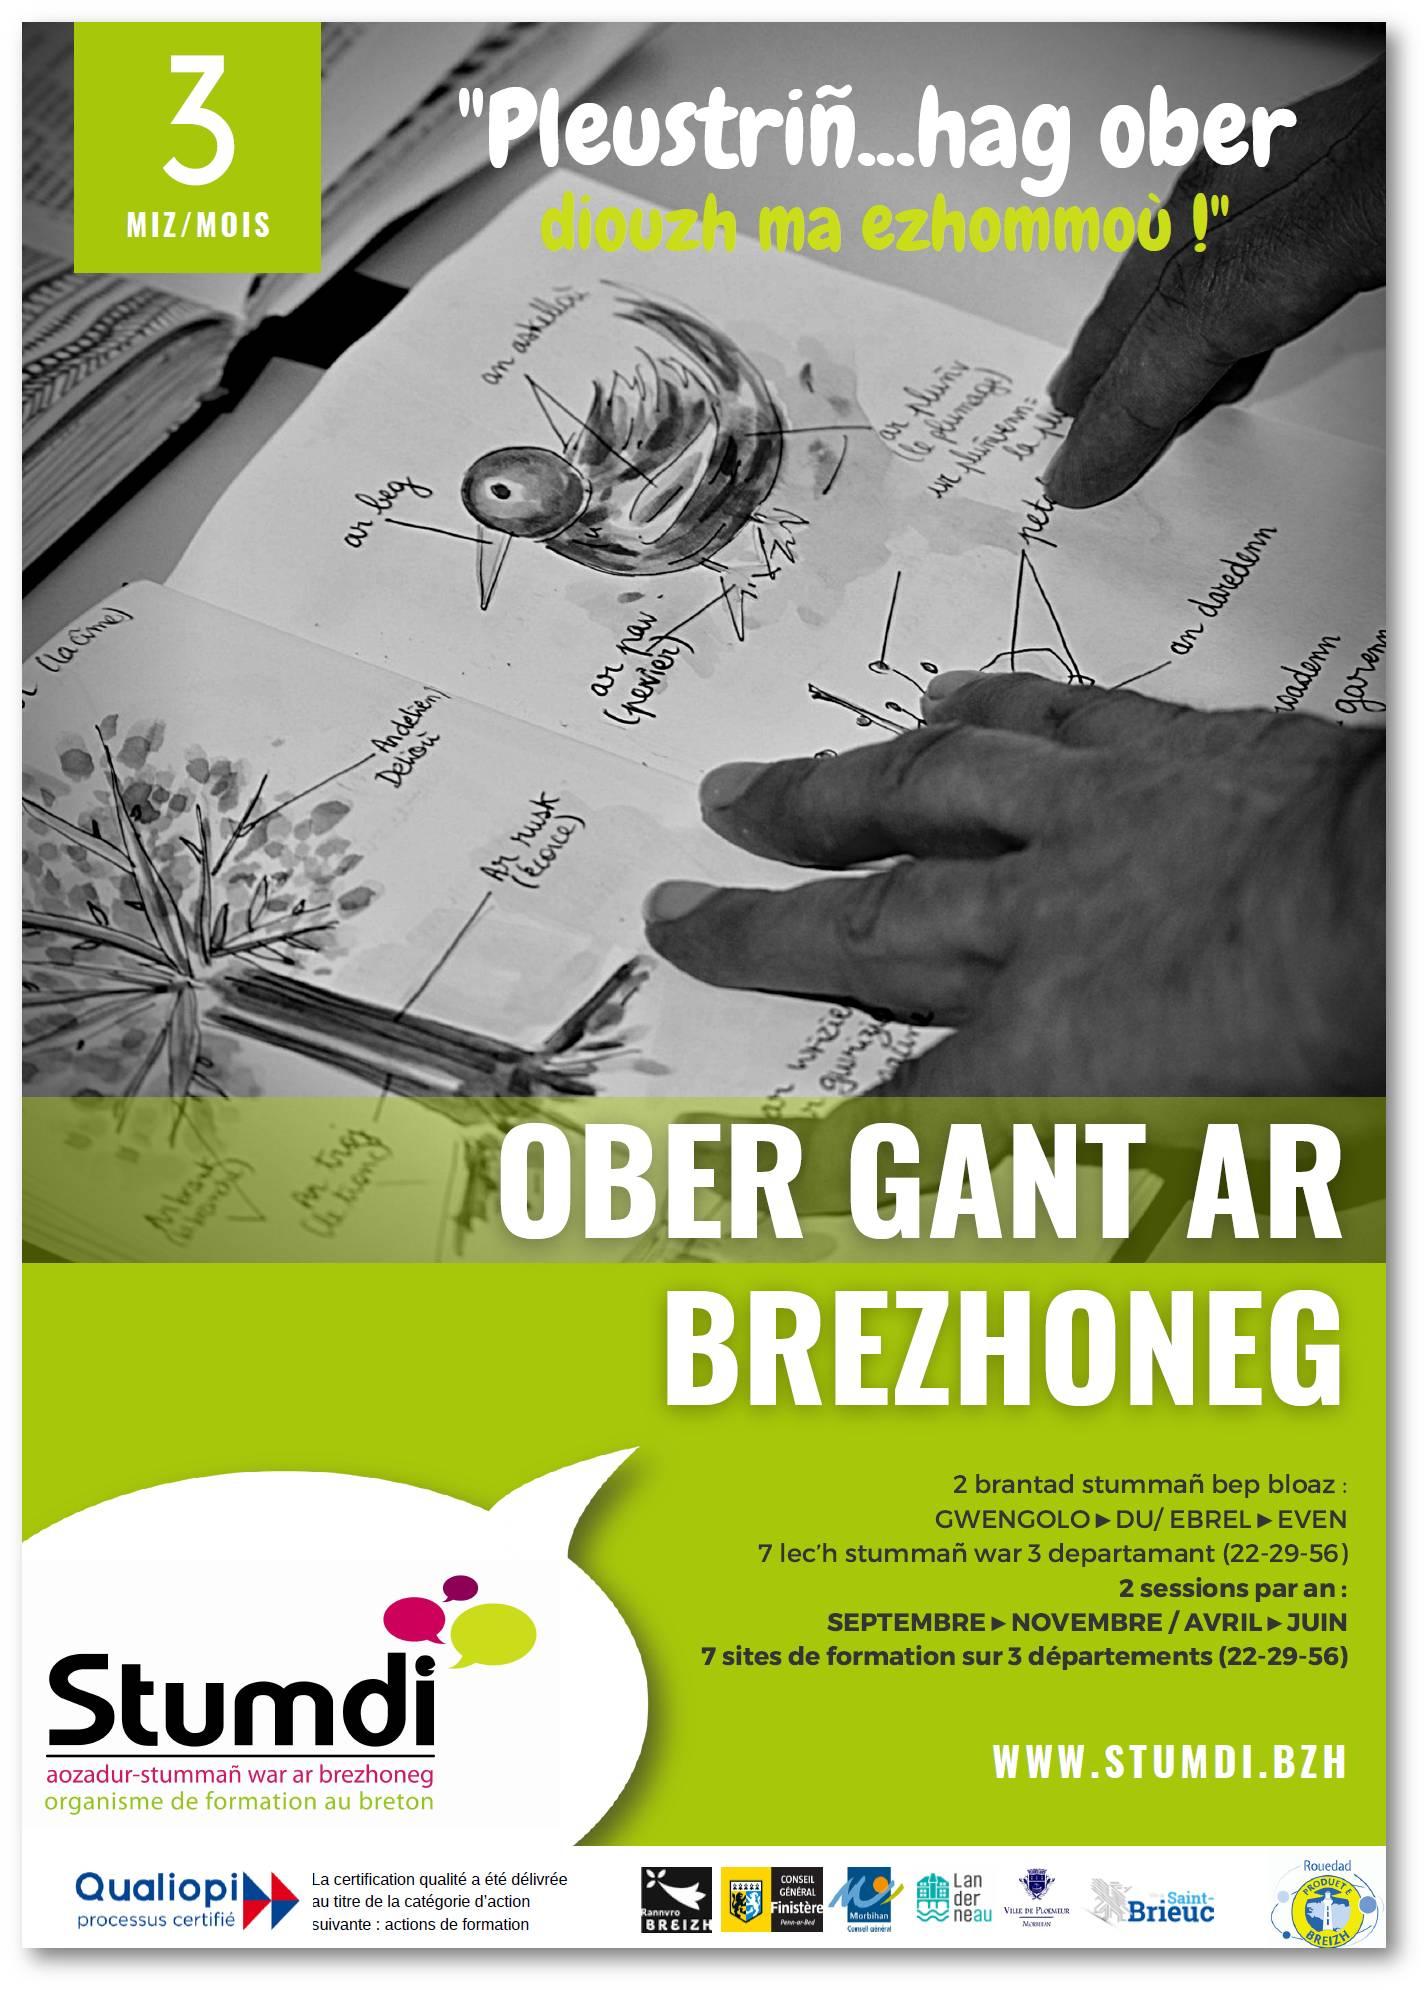 Ober gant ar brezhoneg - Stumdi centre de formation en langue bretonne - Kreizenn stummañ war ar brezhoneg